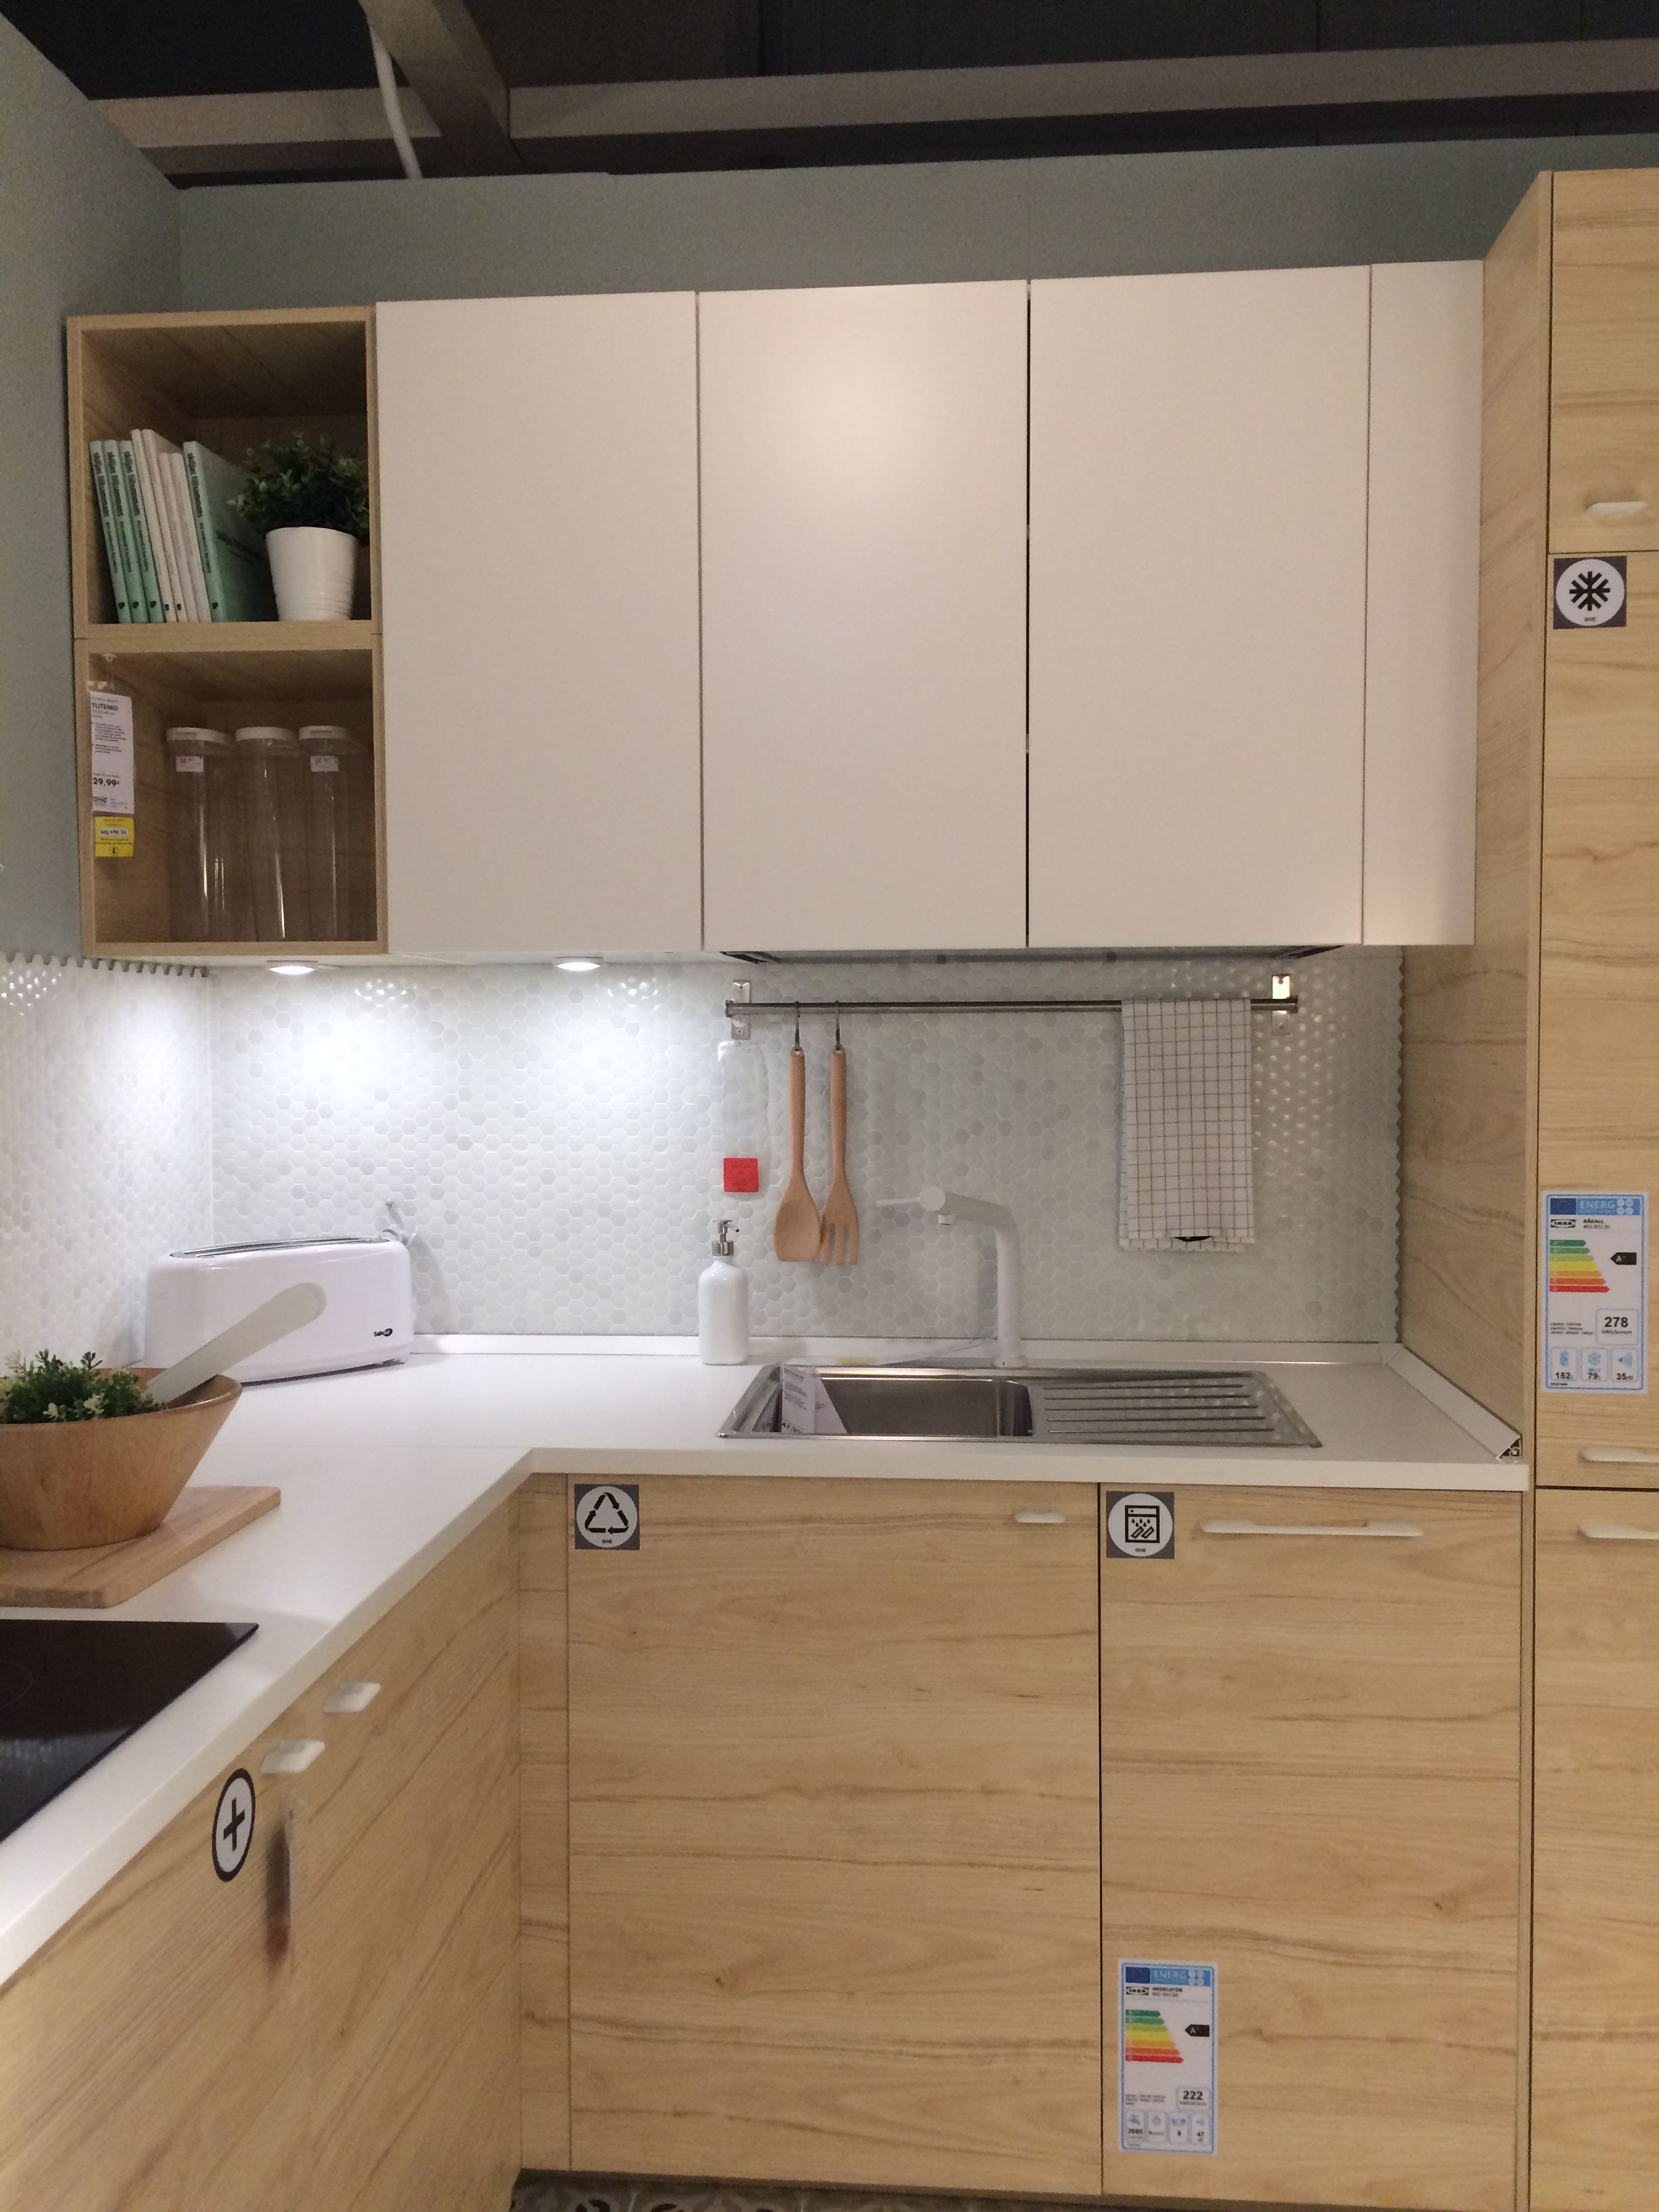 Pin by E S on 165B Kitchen in 2019 Kitchen, Kitchen